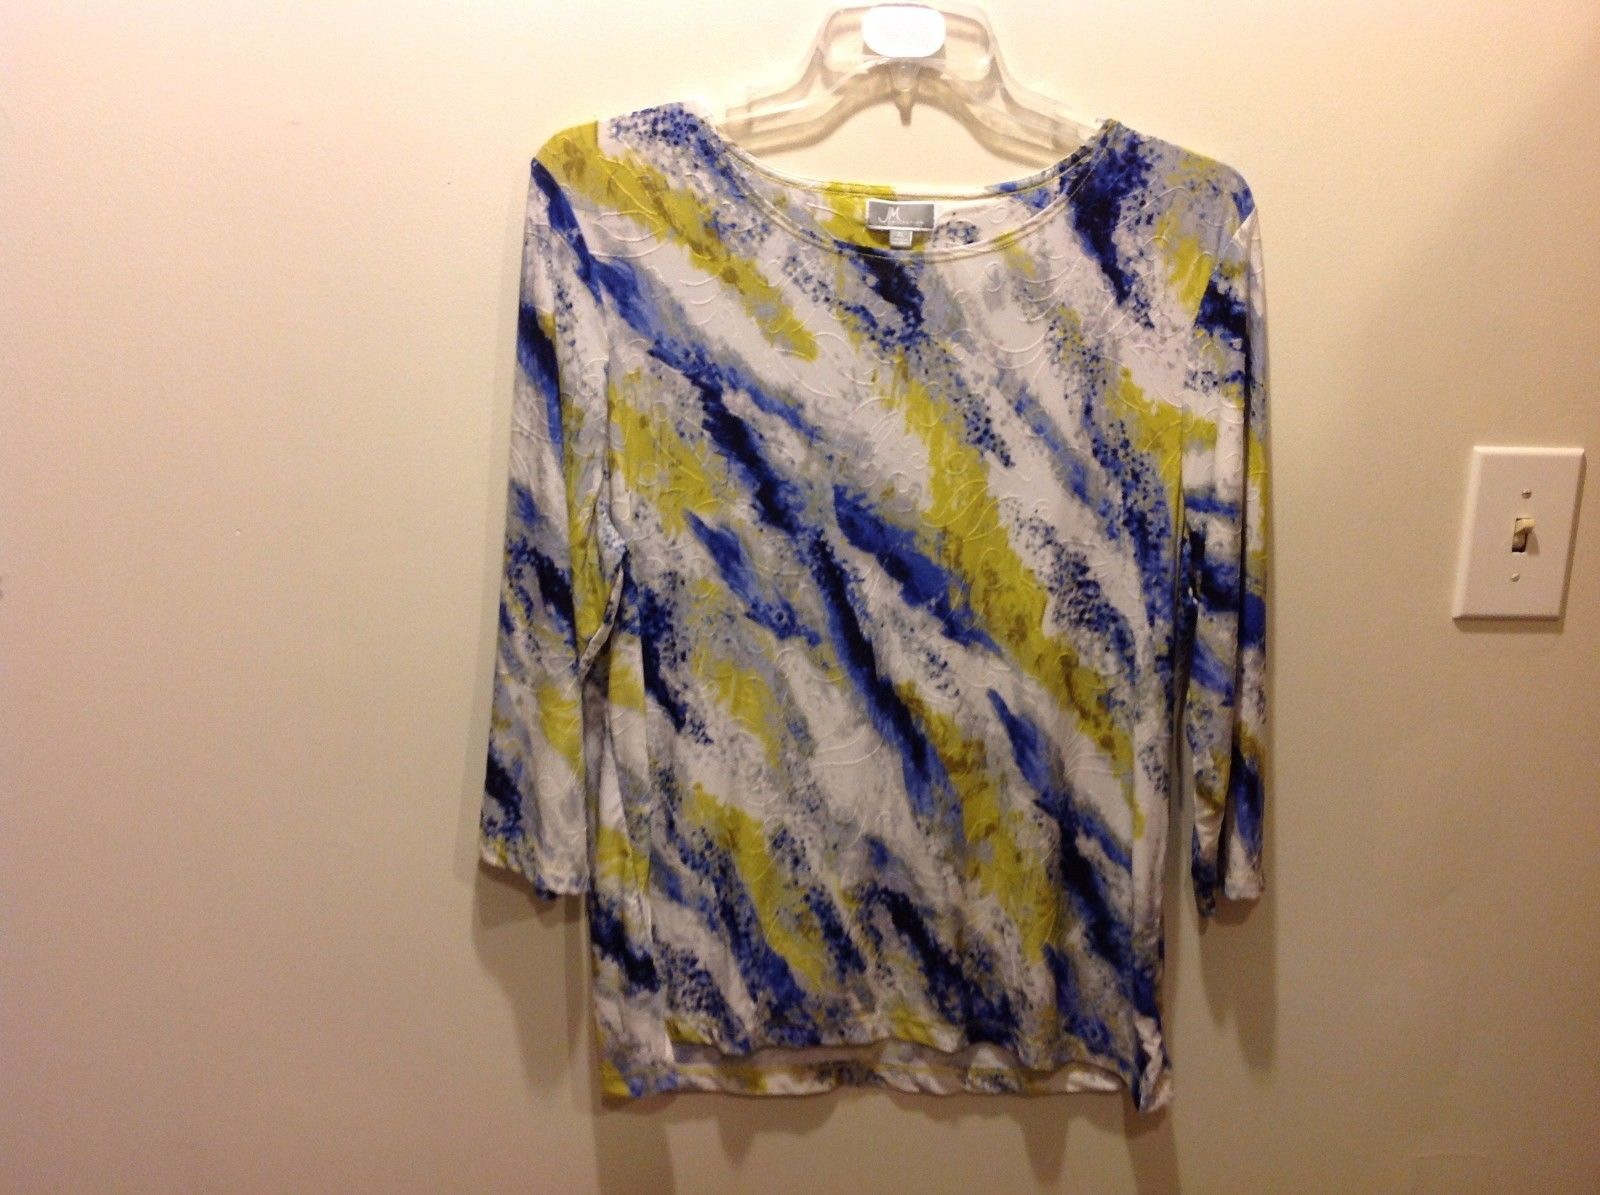 JM Collection Colorful Textured 3/4 Sleeve Blouse Sz XL